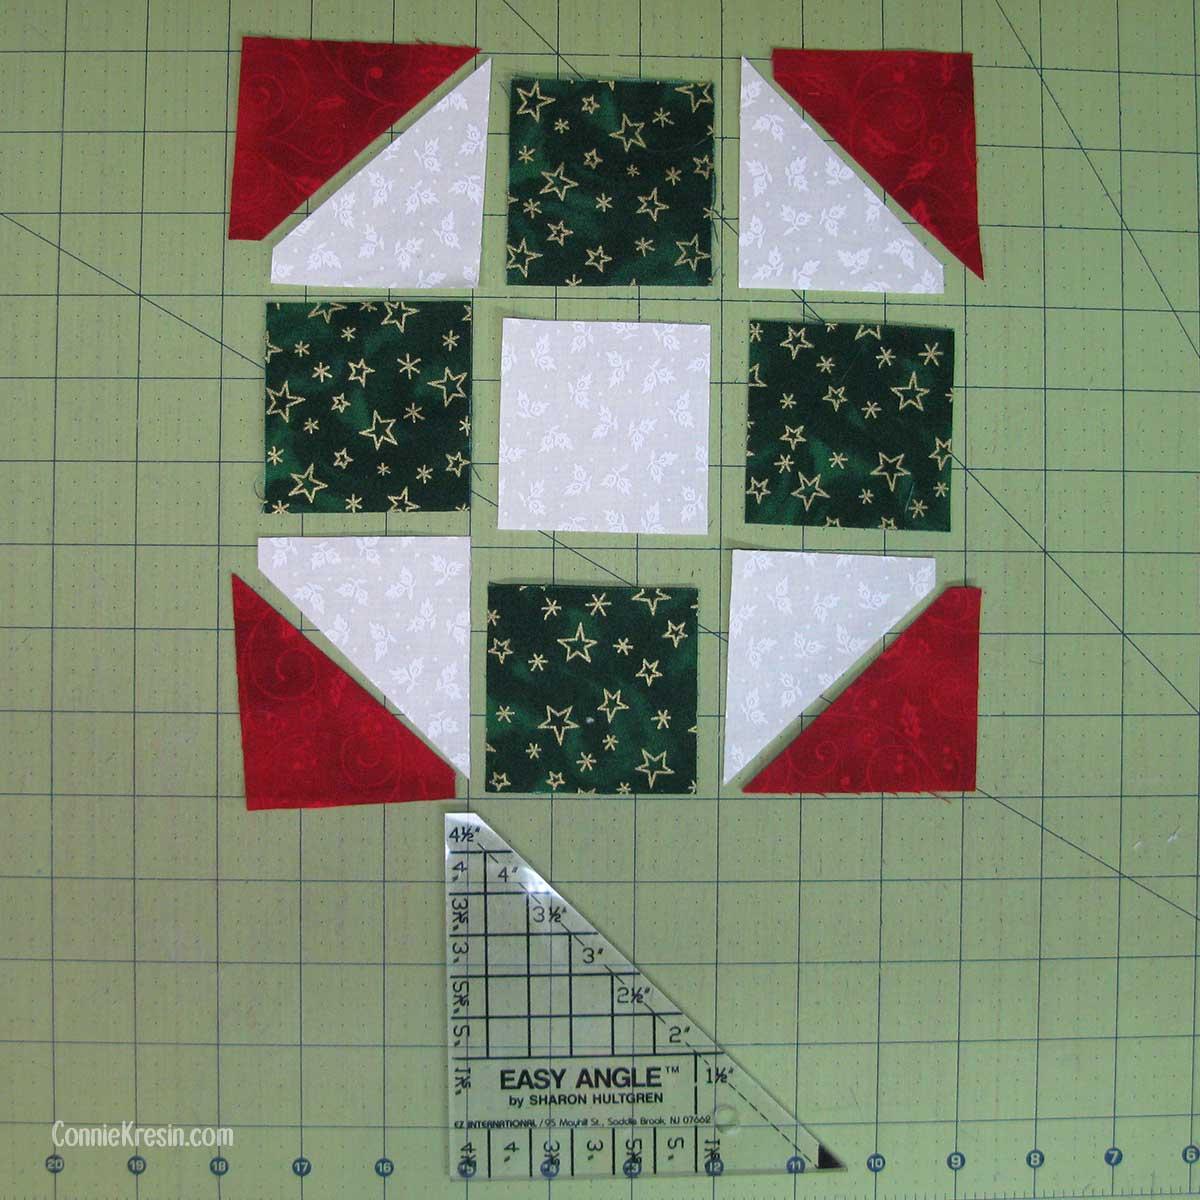 Fabric cut for the mug rug using the Easy Angle ruler